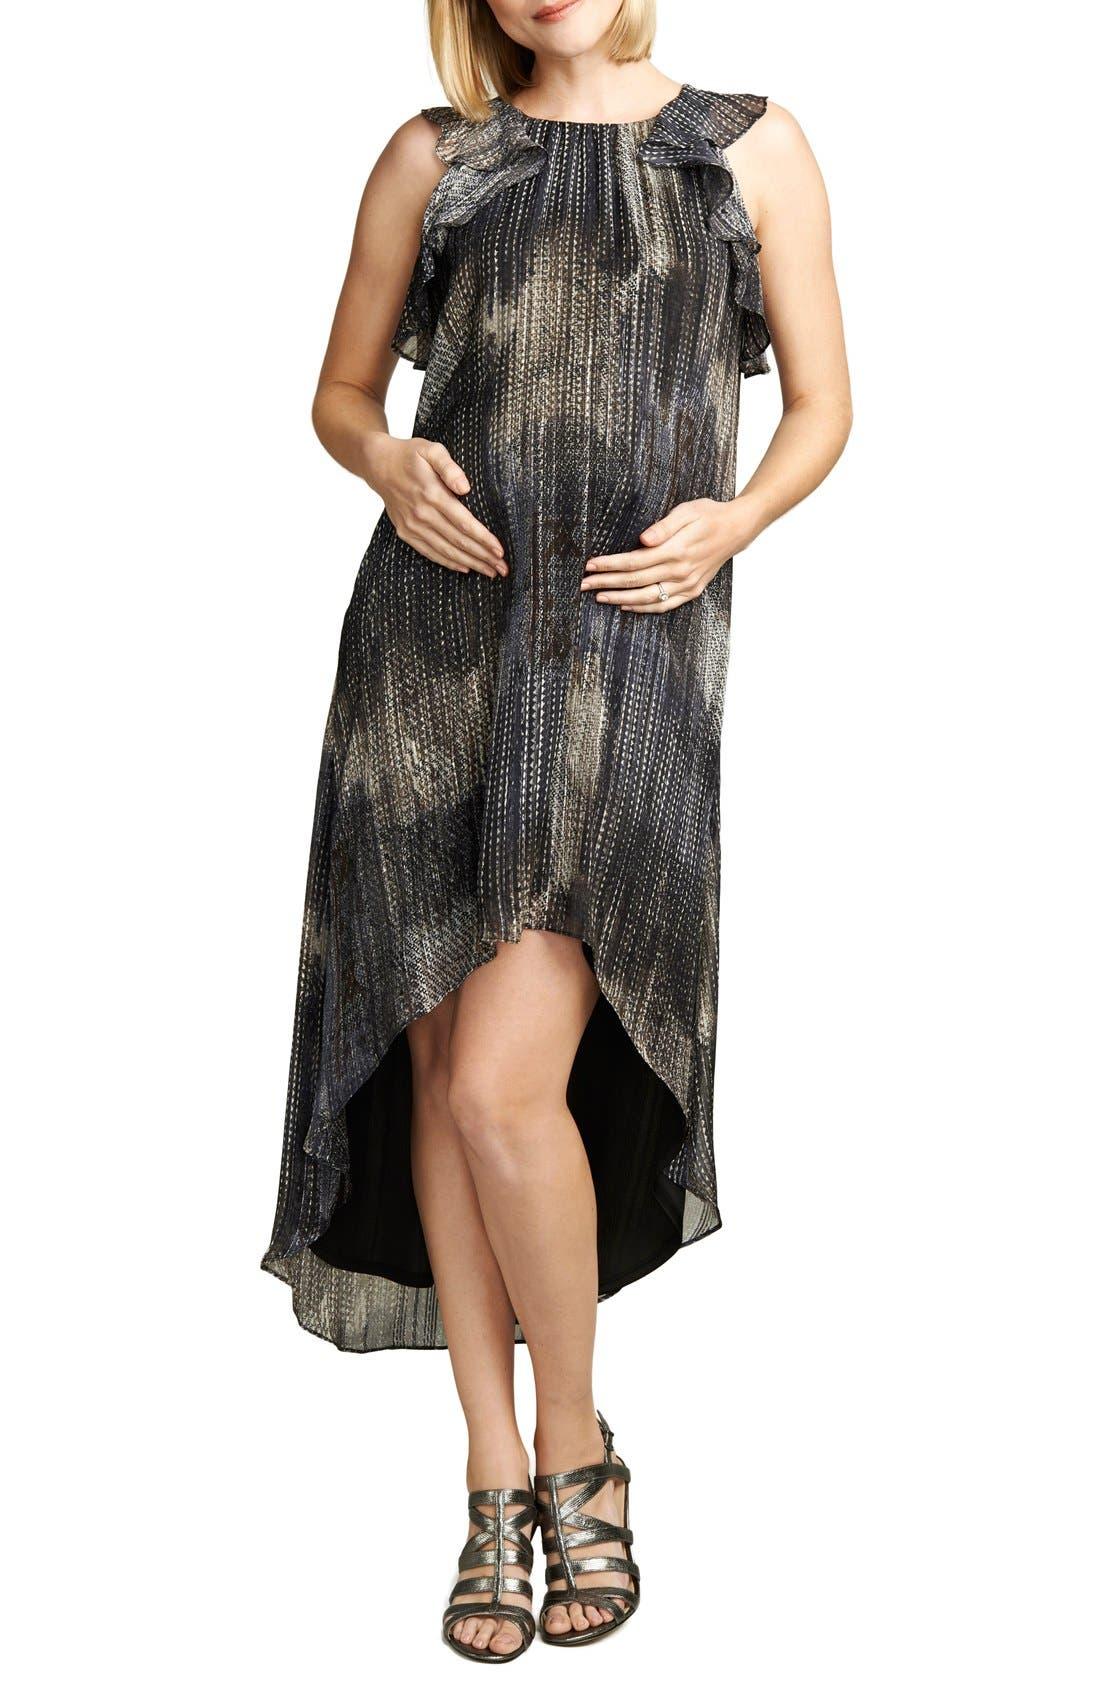 Ruffle Chiffon High/Low Maternity Dress,                             Main thumbnail 1, color,                             METALLIC LUREX PRINT